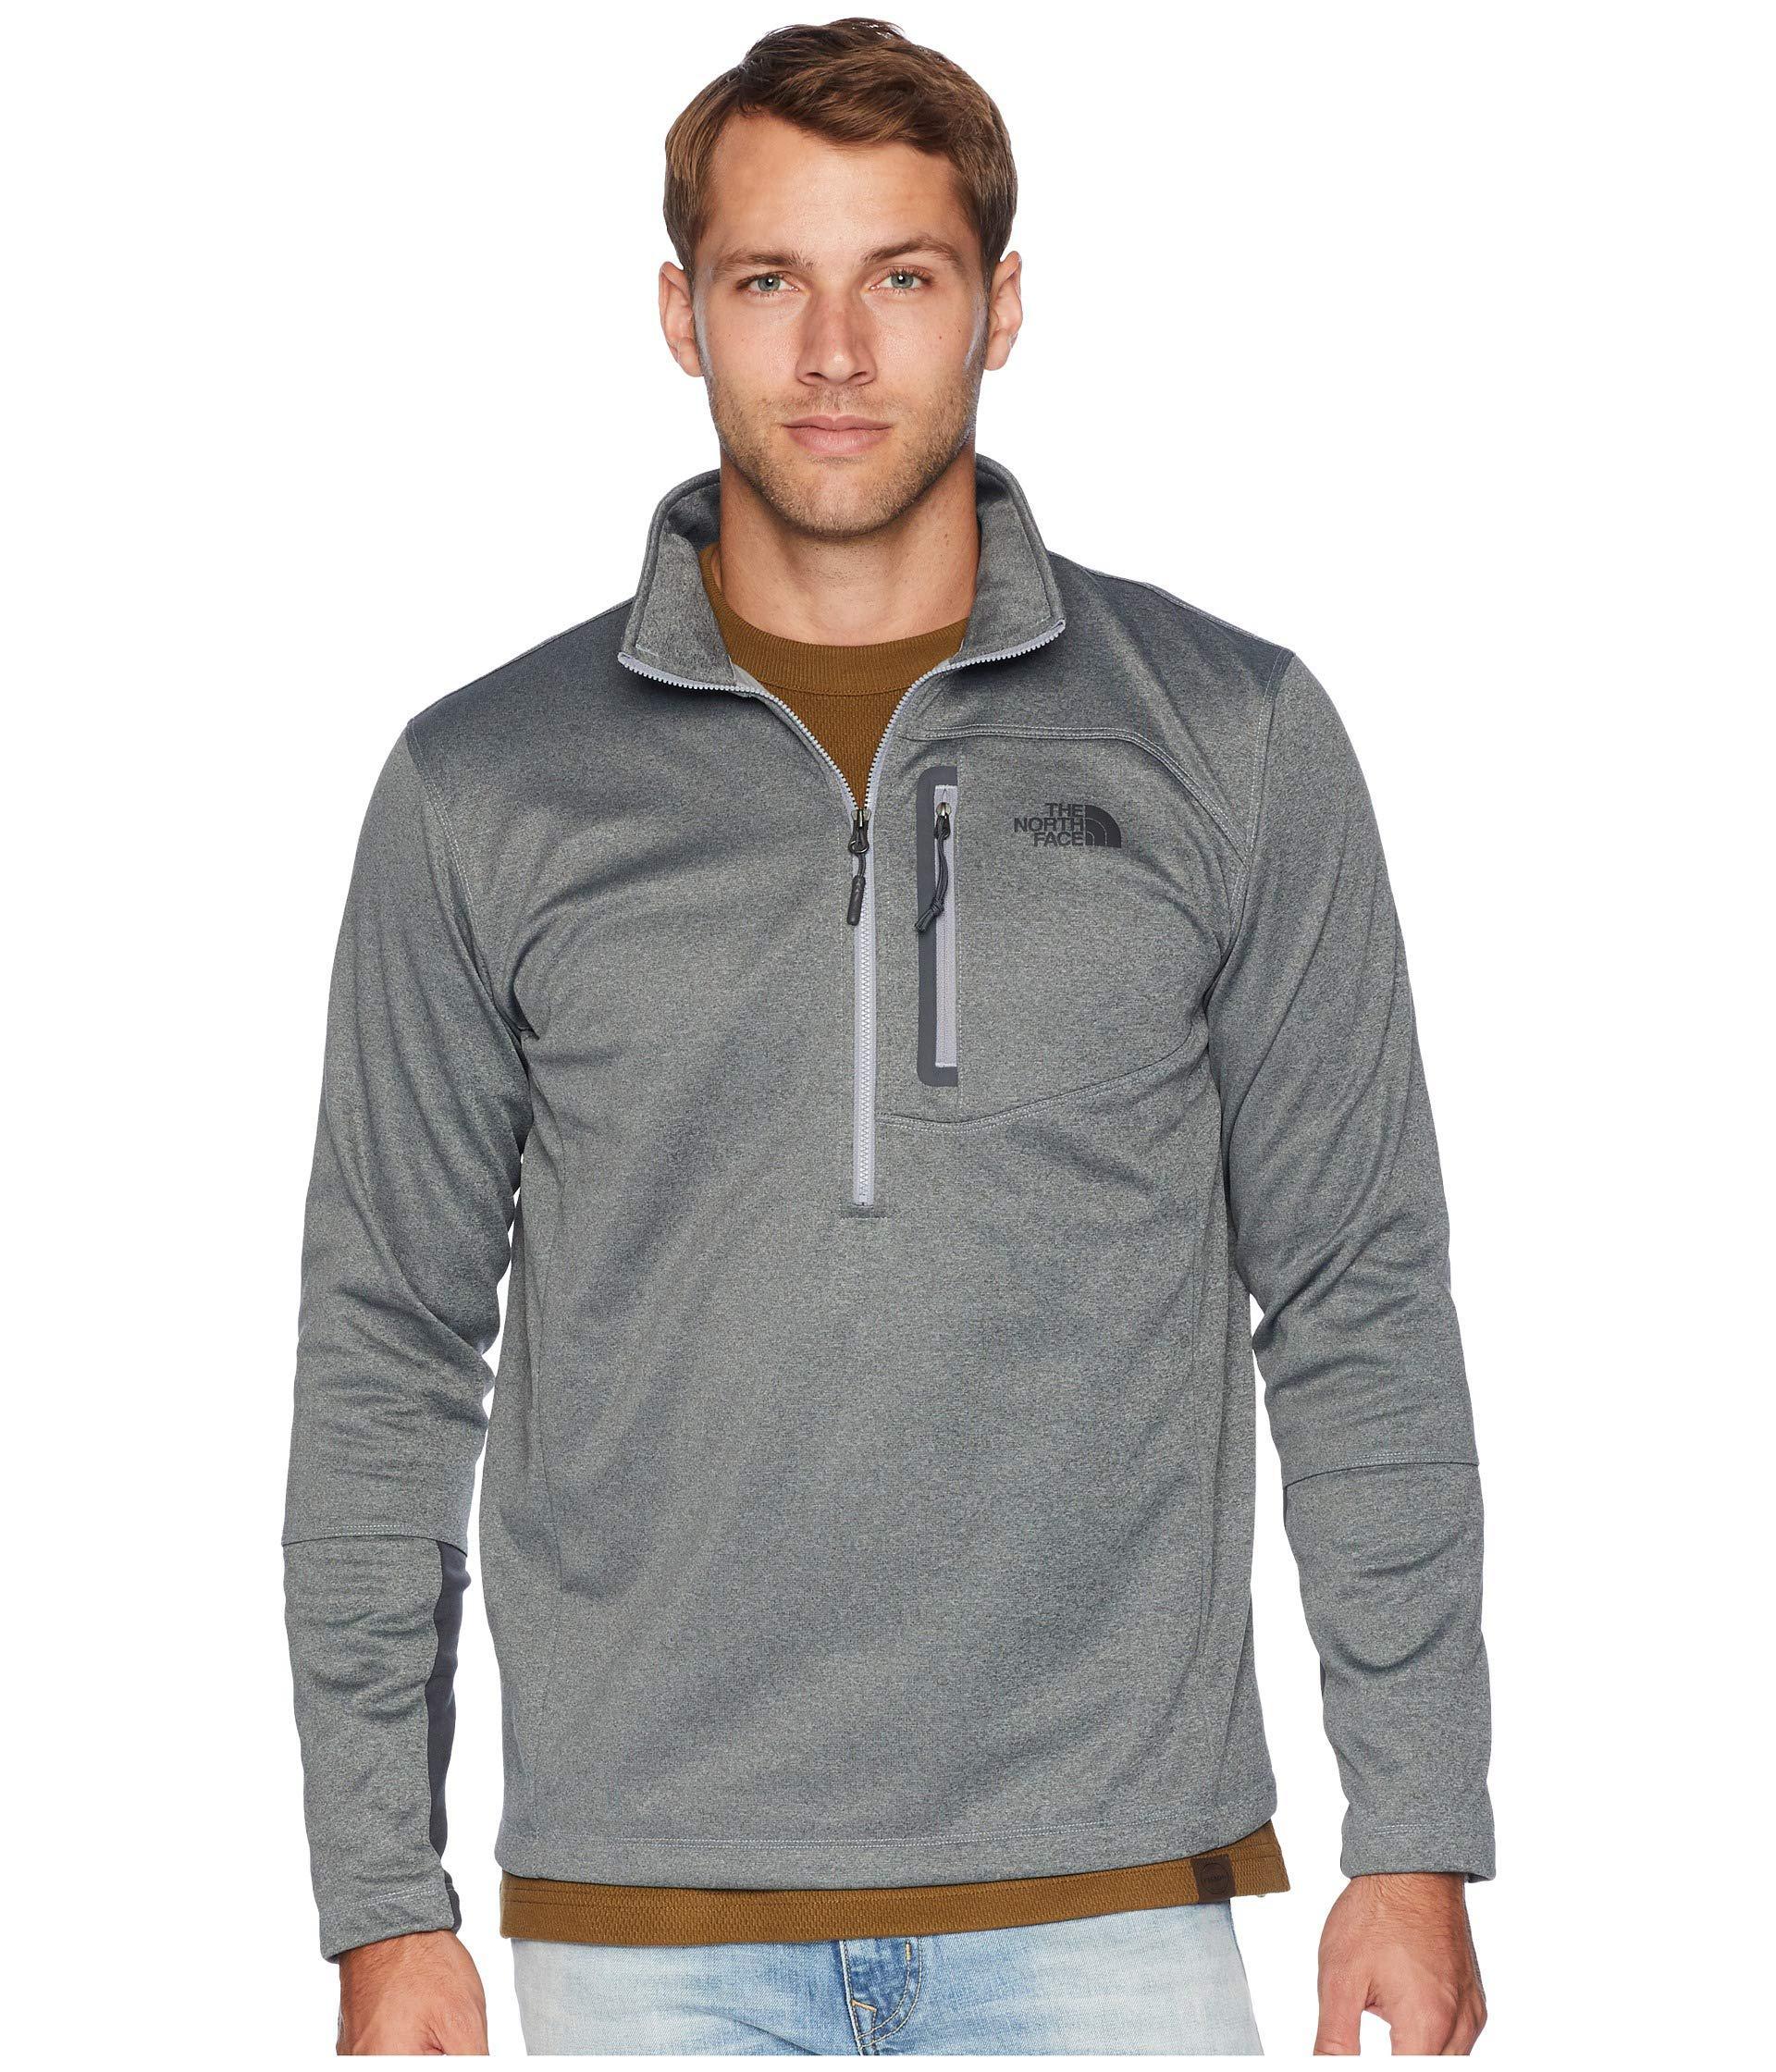 The North Face Men/'s Canyonlands Full Zip TNF Medium Grey Heather